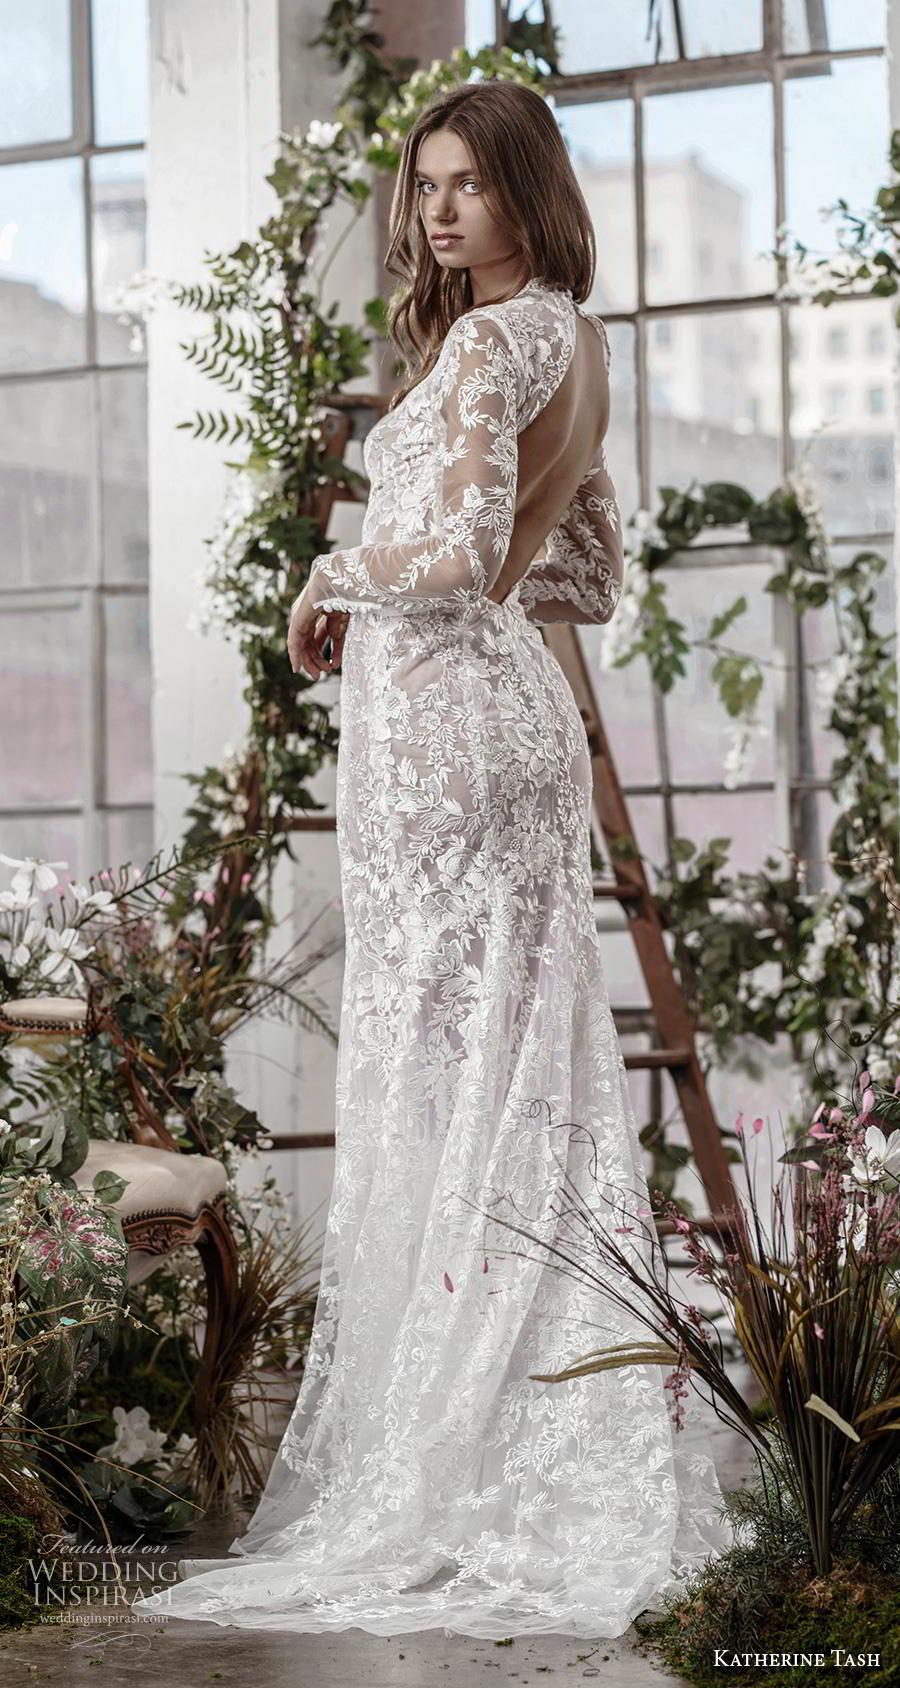 katherine tash fall 2019 bridal long sleeves deep plunging v neck full embellishment slit skirt sexy elegant fit and flare sheath wedding dress keyhole back medium train (10) bv